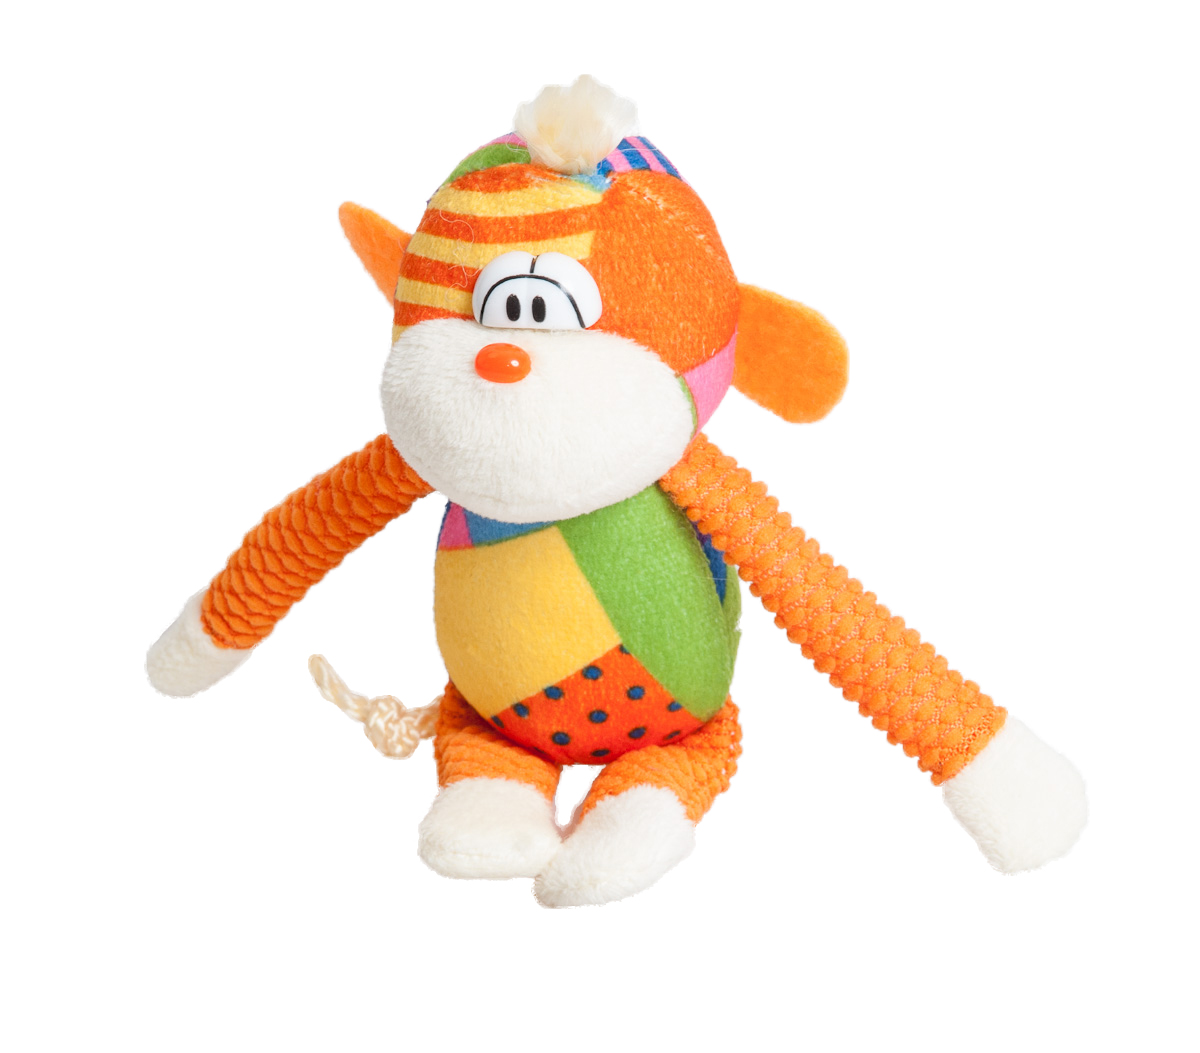 Fancy Обезьянка Хели, цвет в ассортименте fancy слим обезьянка